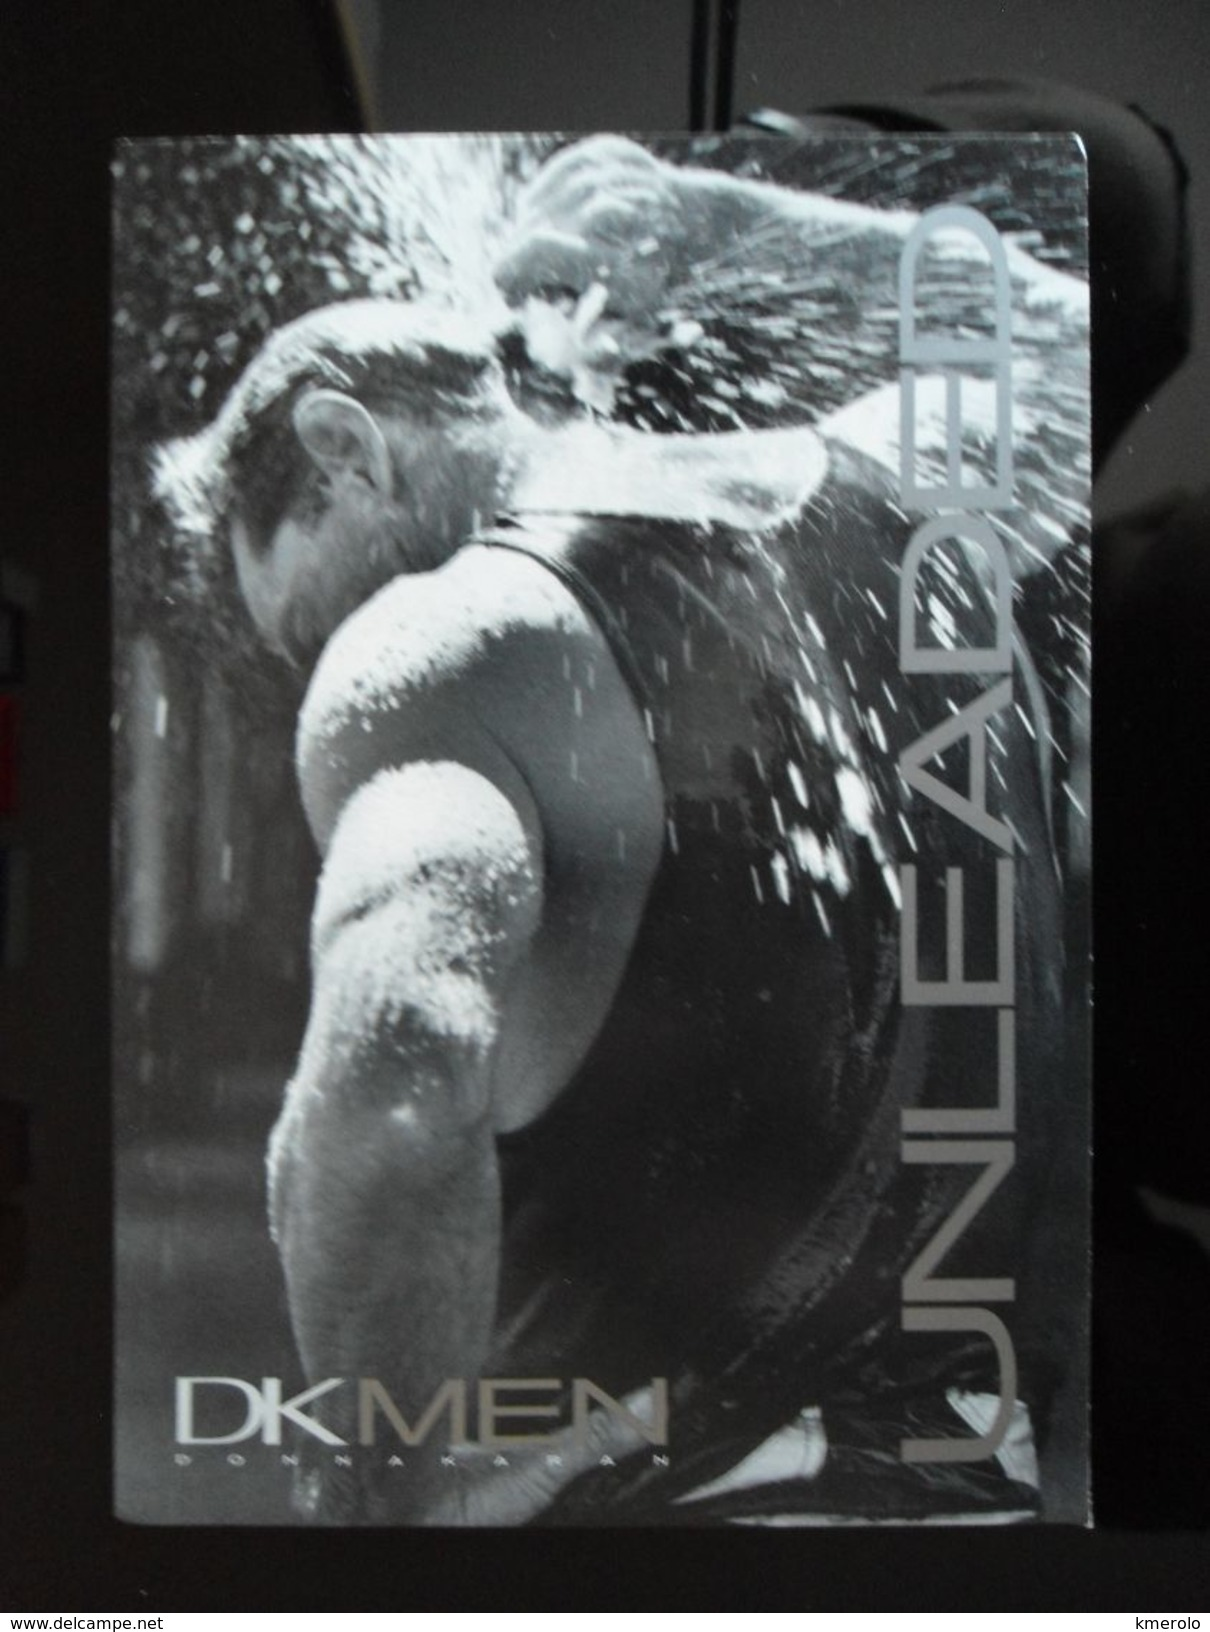 DKMEN Parfum Carte Postale - Perfume Cards